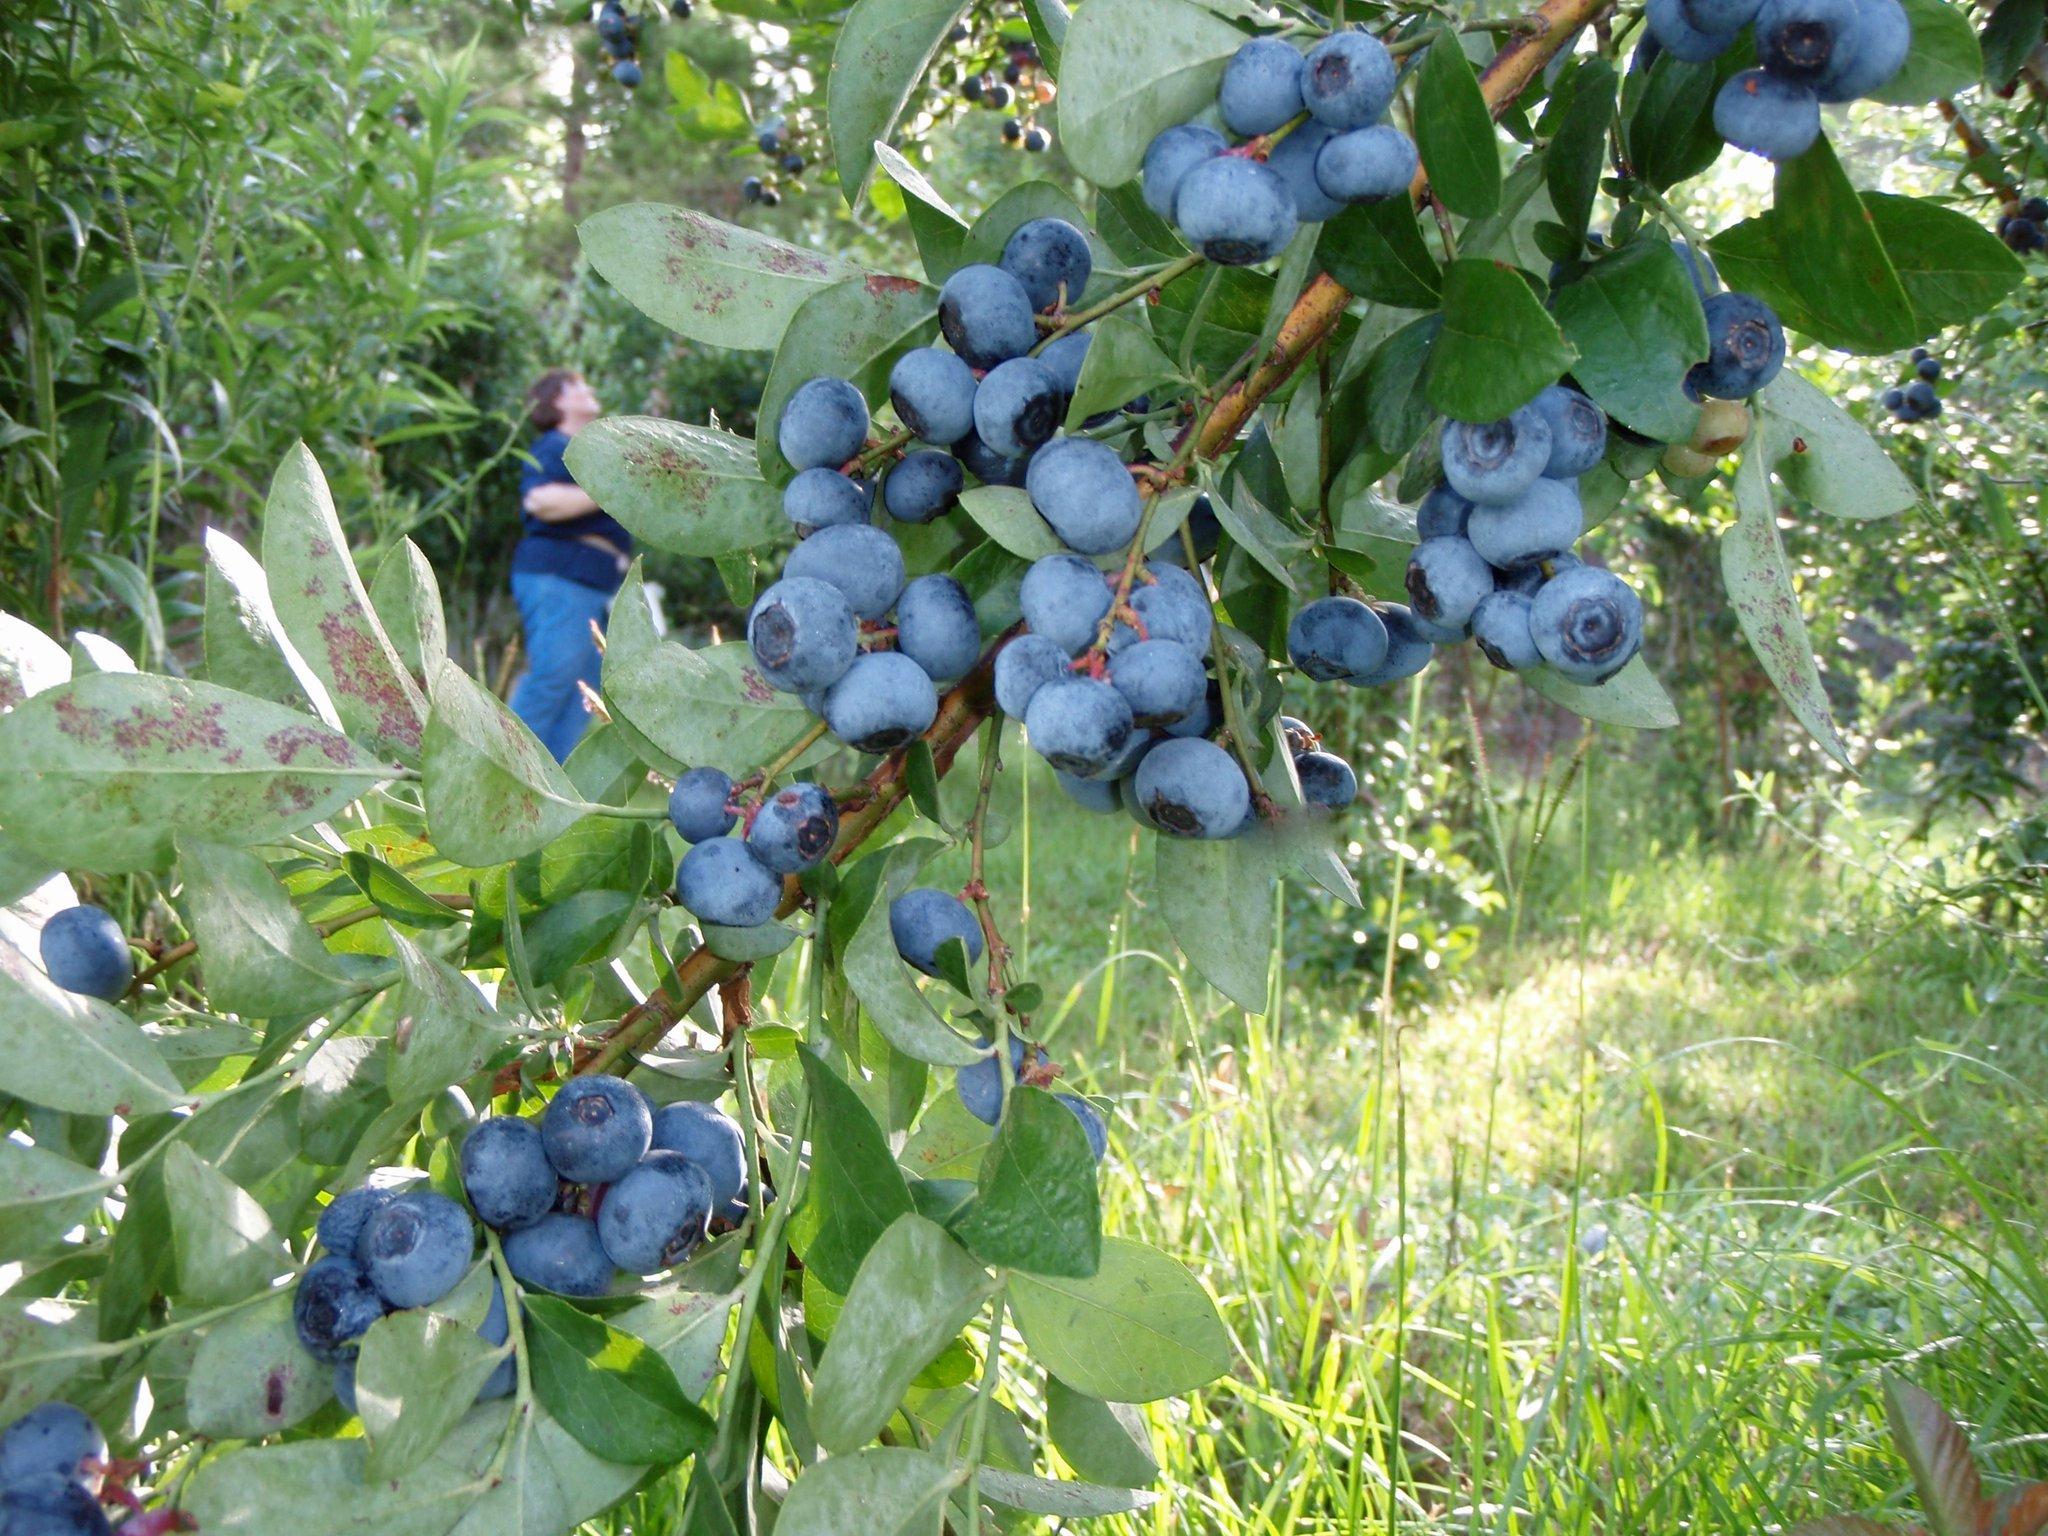 Berry Sweet Orchards (Ethel, LA)